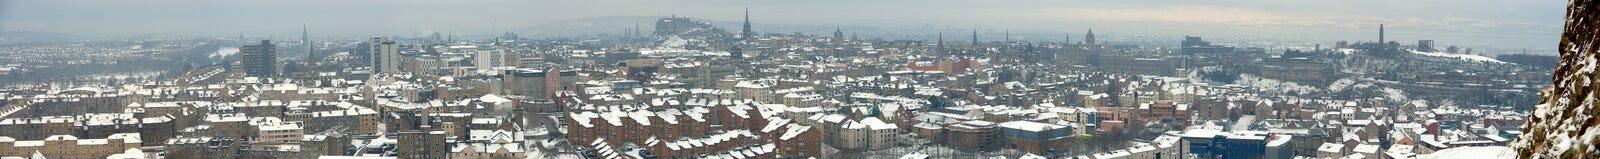 Panorama de Edimburgo, Escocia, en nieve Foto de archivo